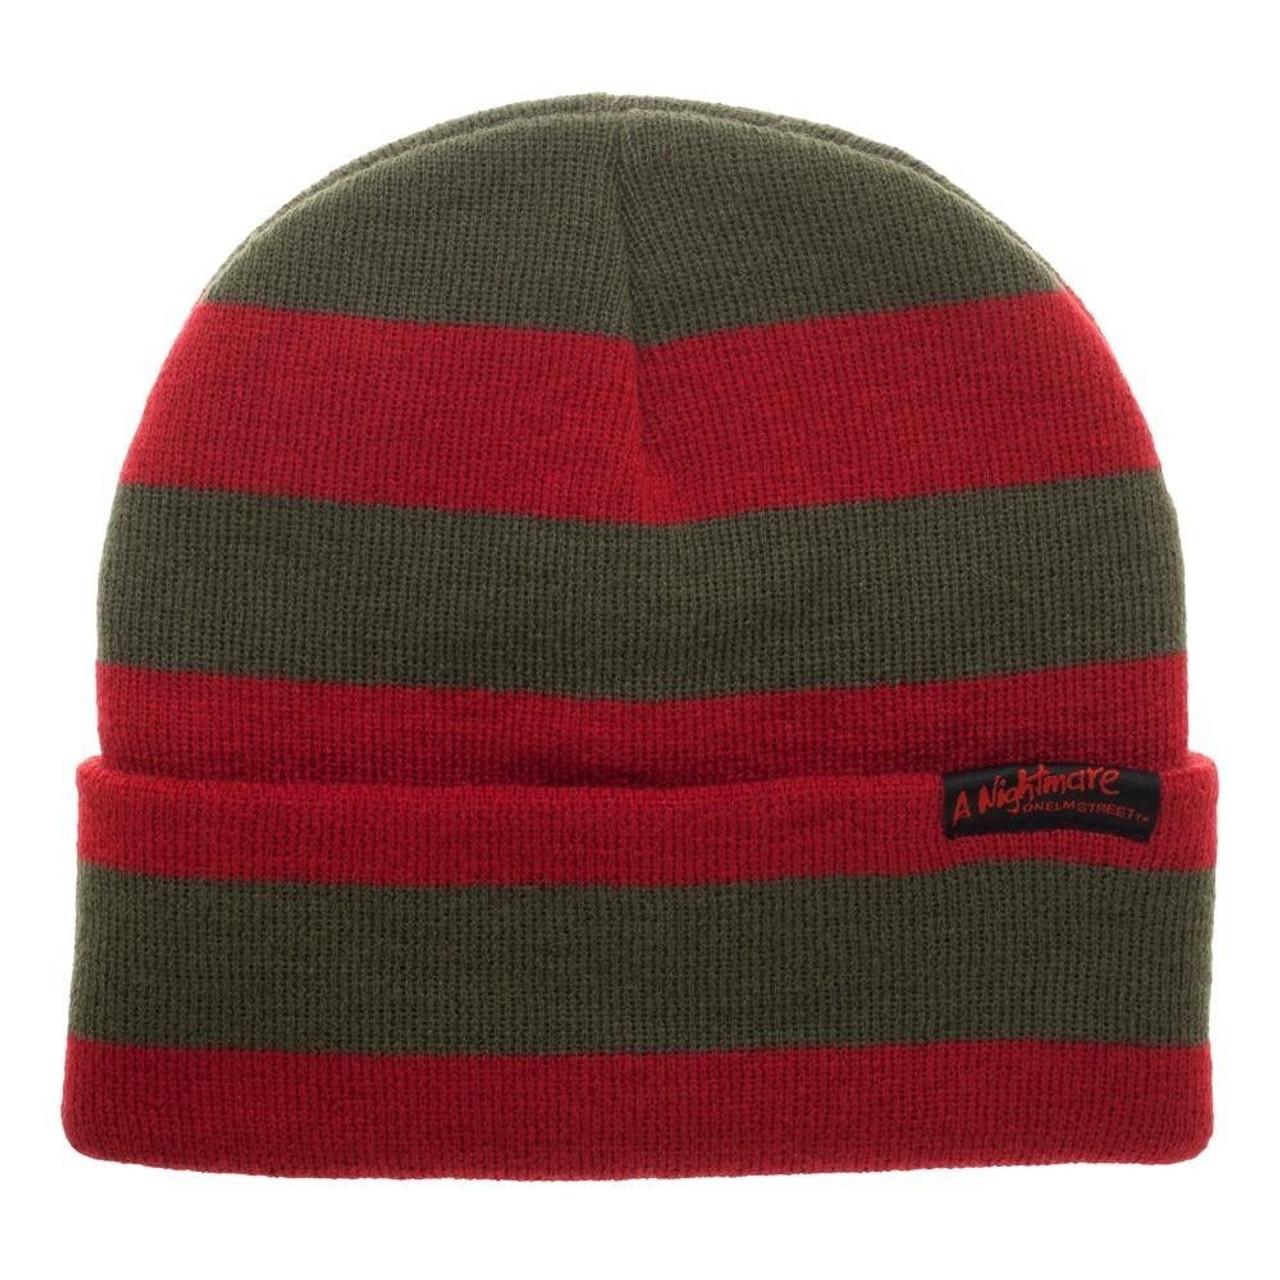 299133a2ec1772 Bioworld Nightmare on Elm Street Freddy Sweater Knit Beanie Cap Hat  KC6YIWNOE - Fearless Apparel